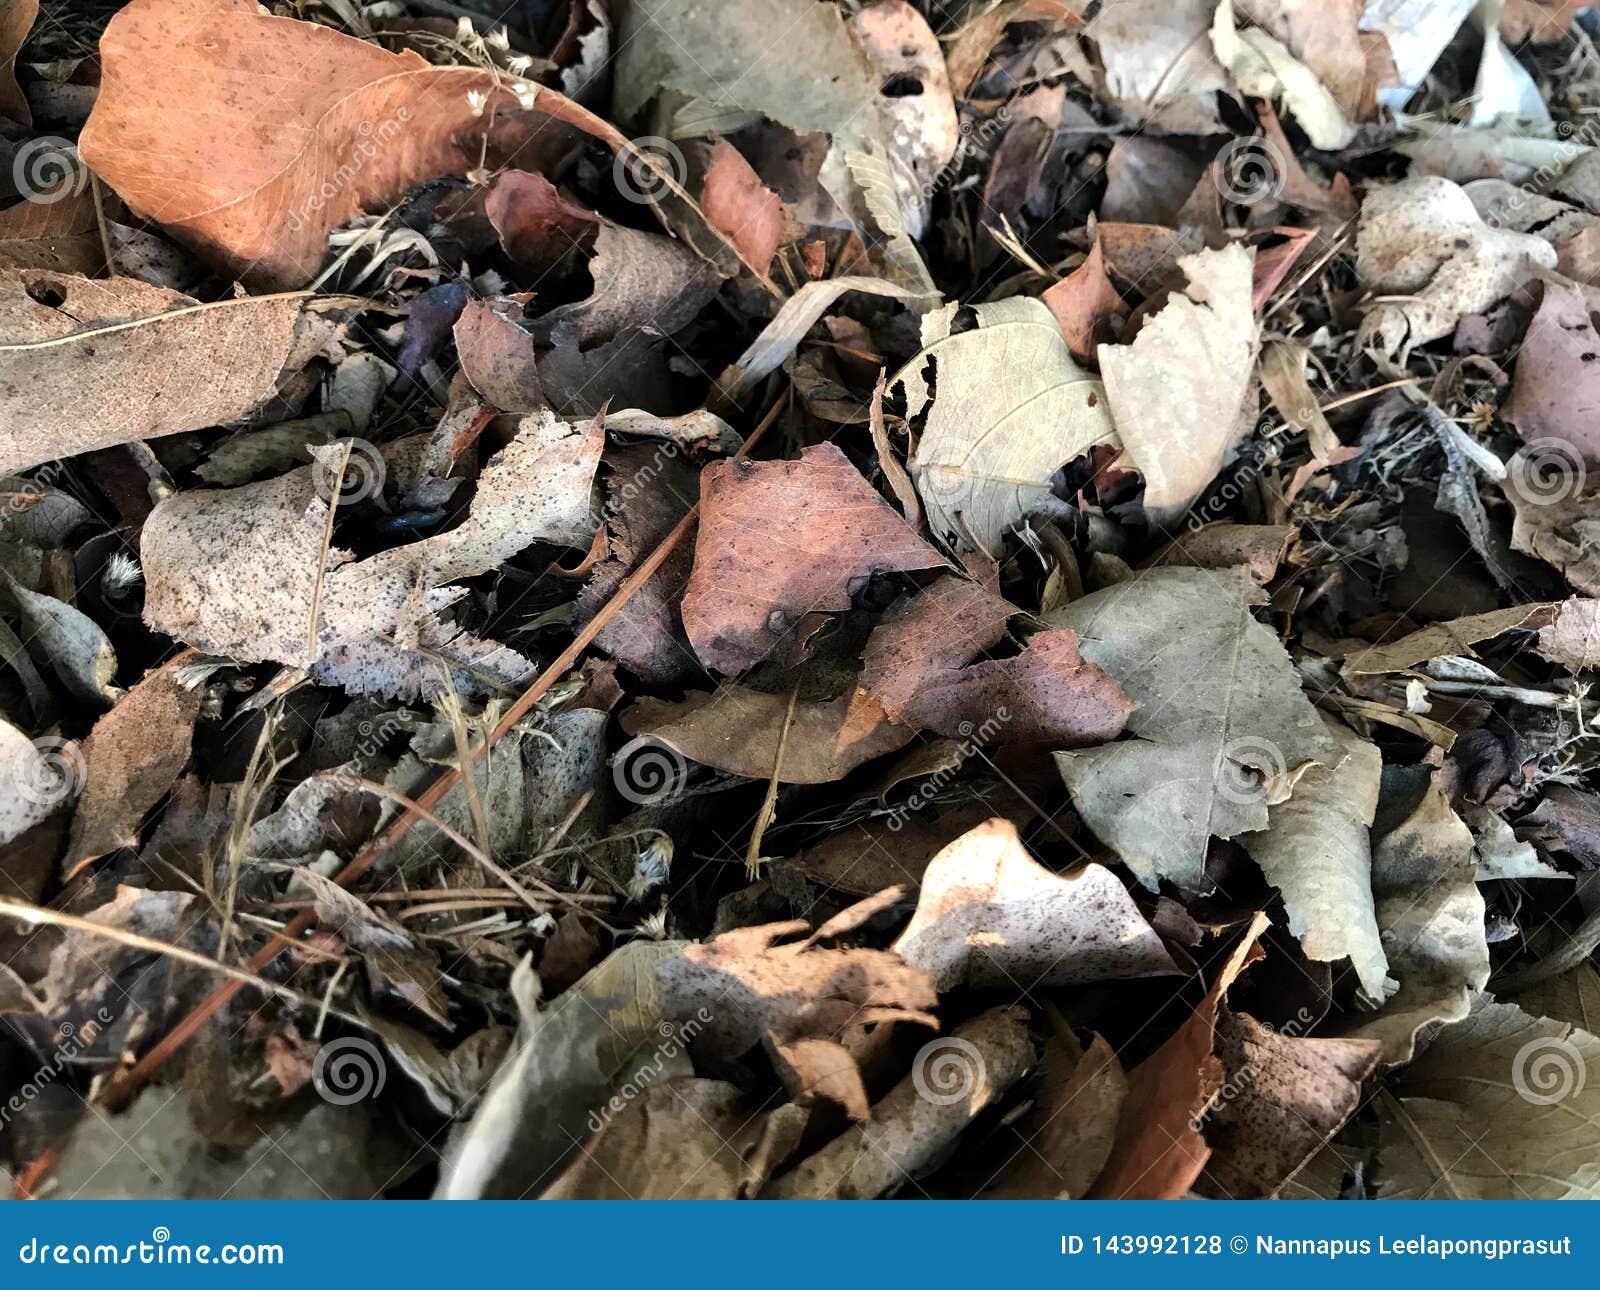 Dry leaf dead leaves plant ground